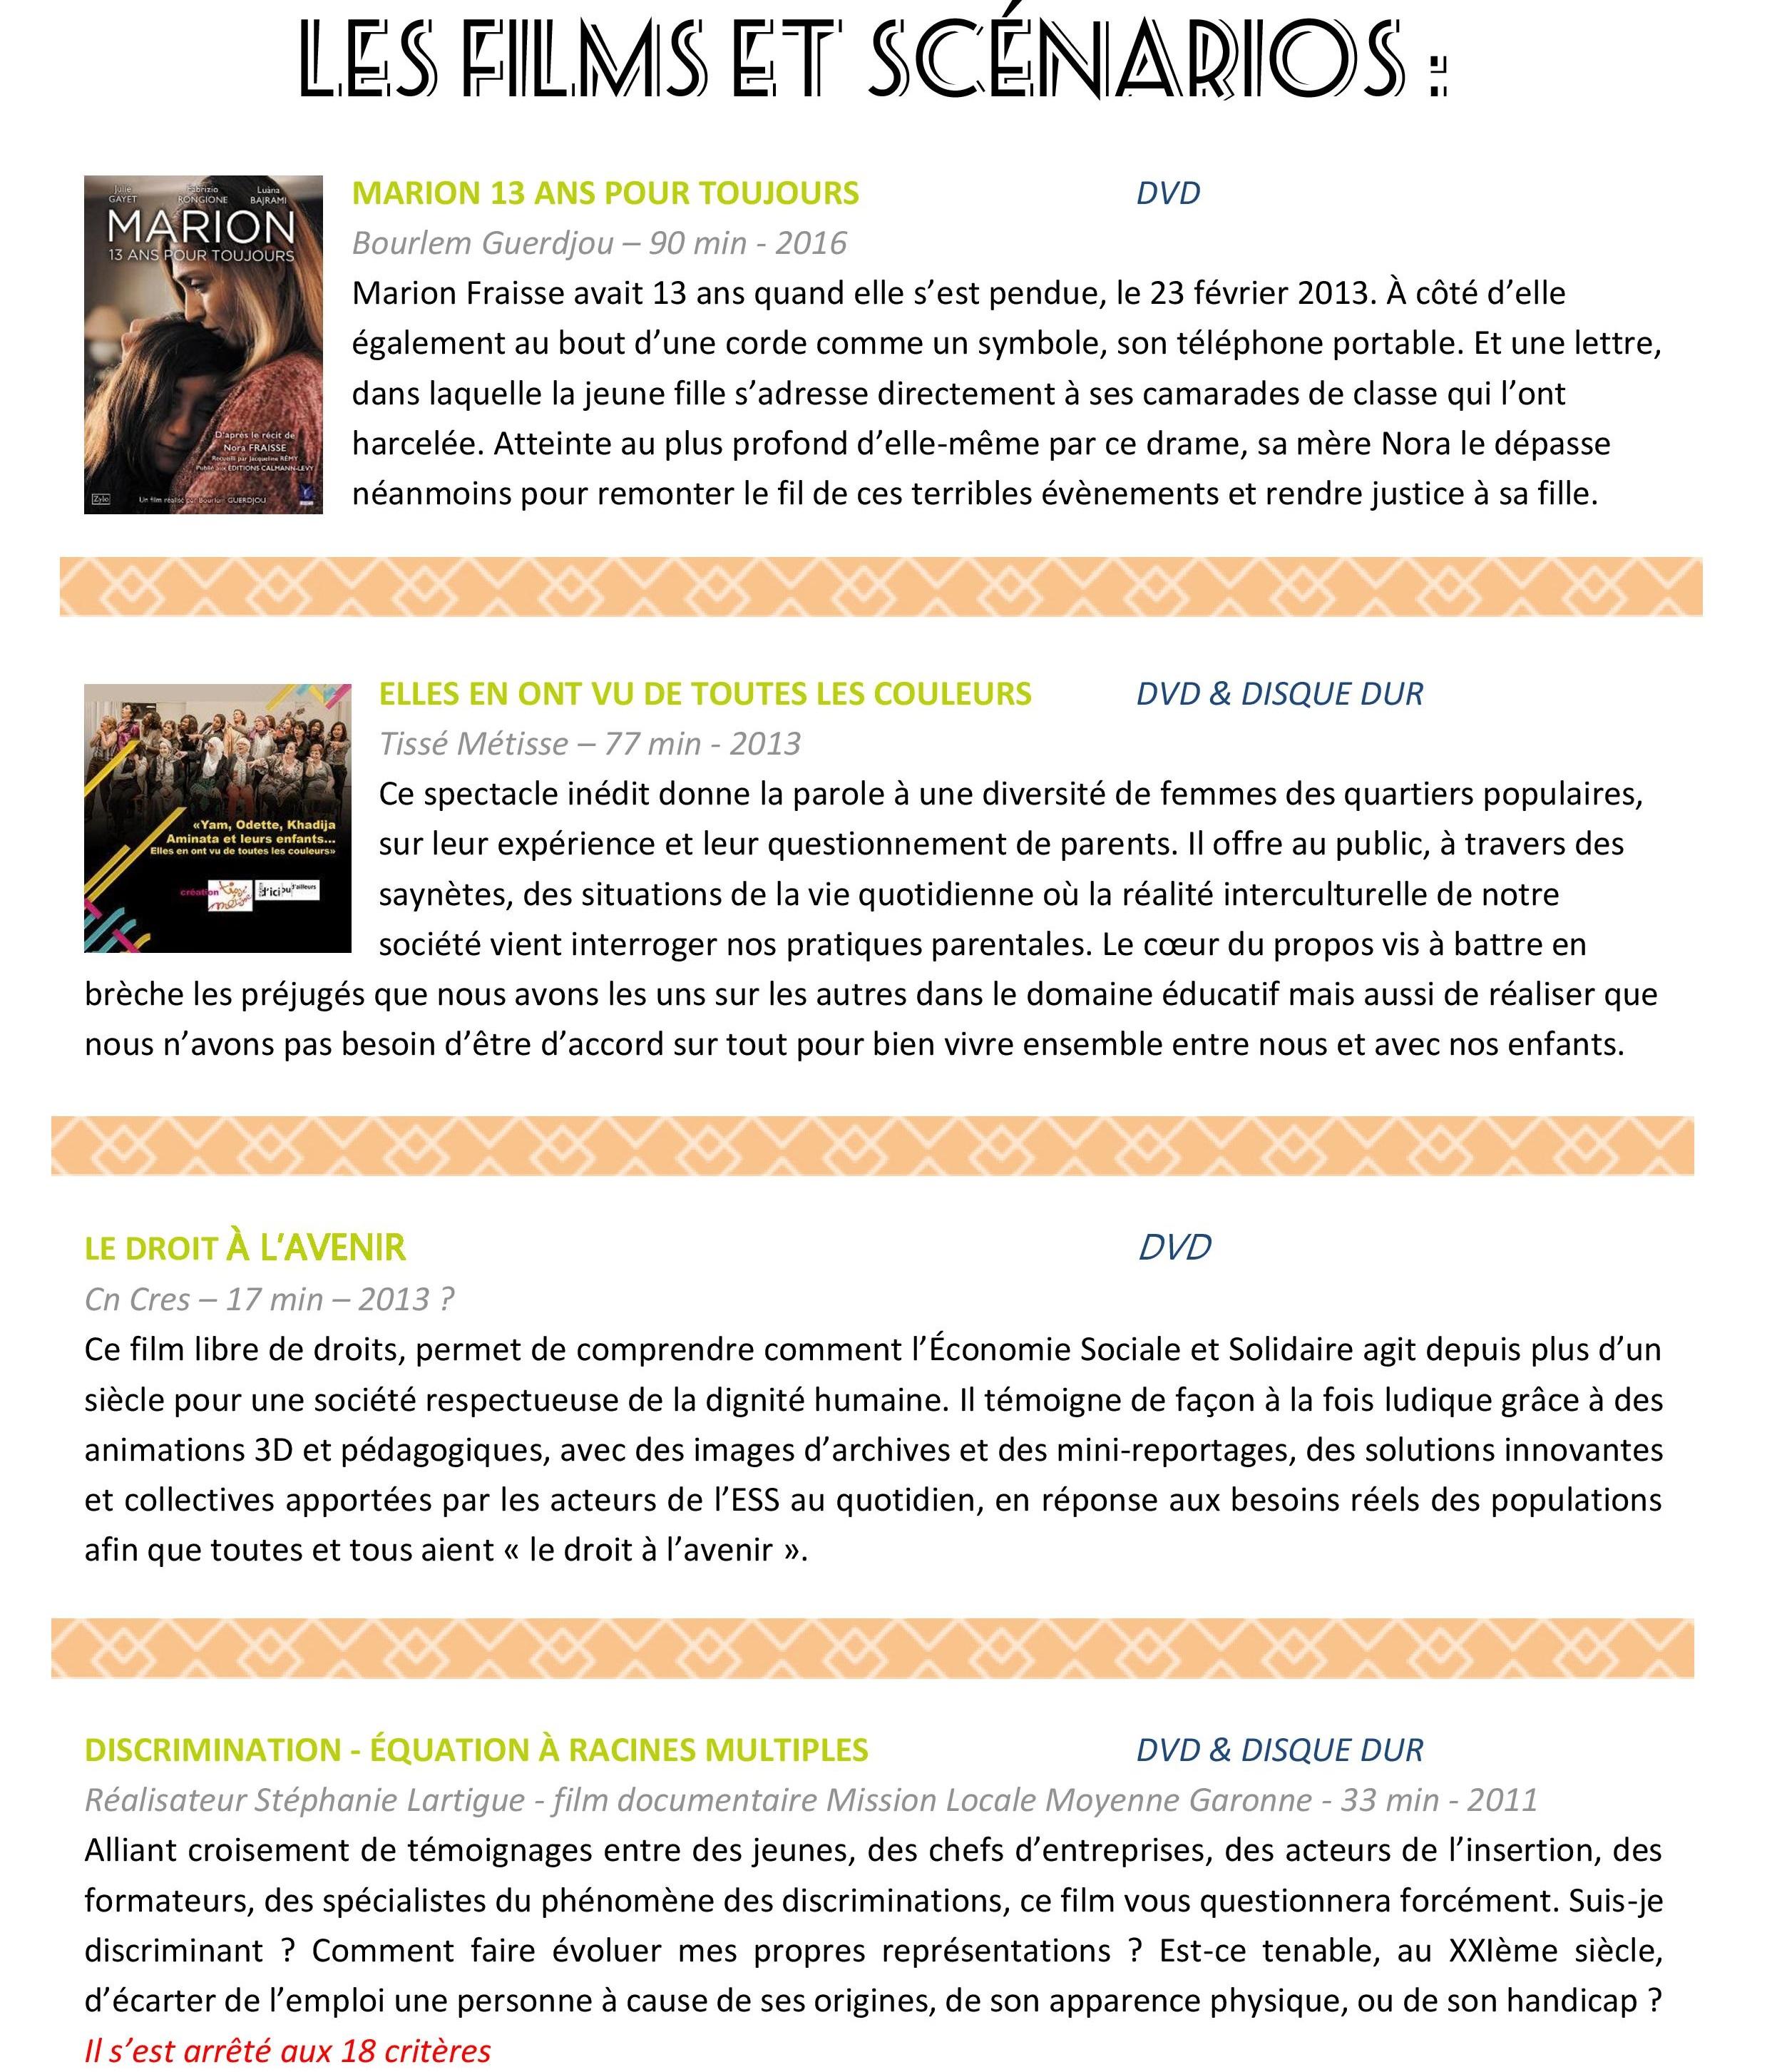 Sensibilisation par la vidéo - Films & scénarios.